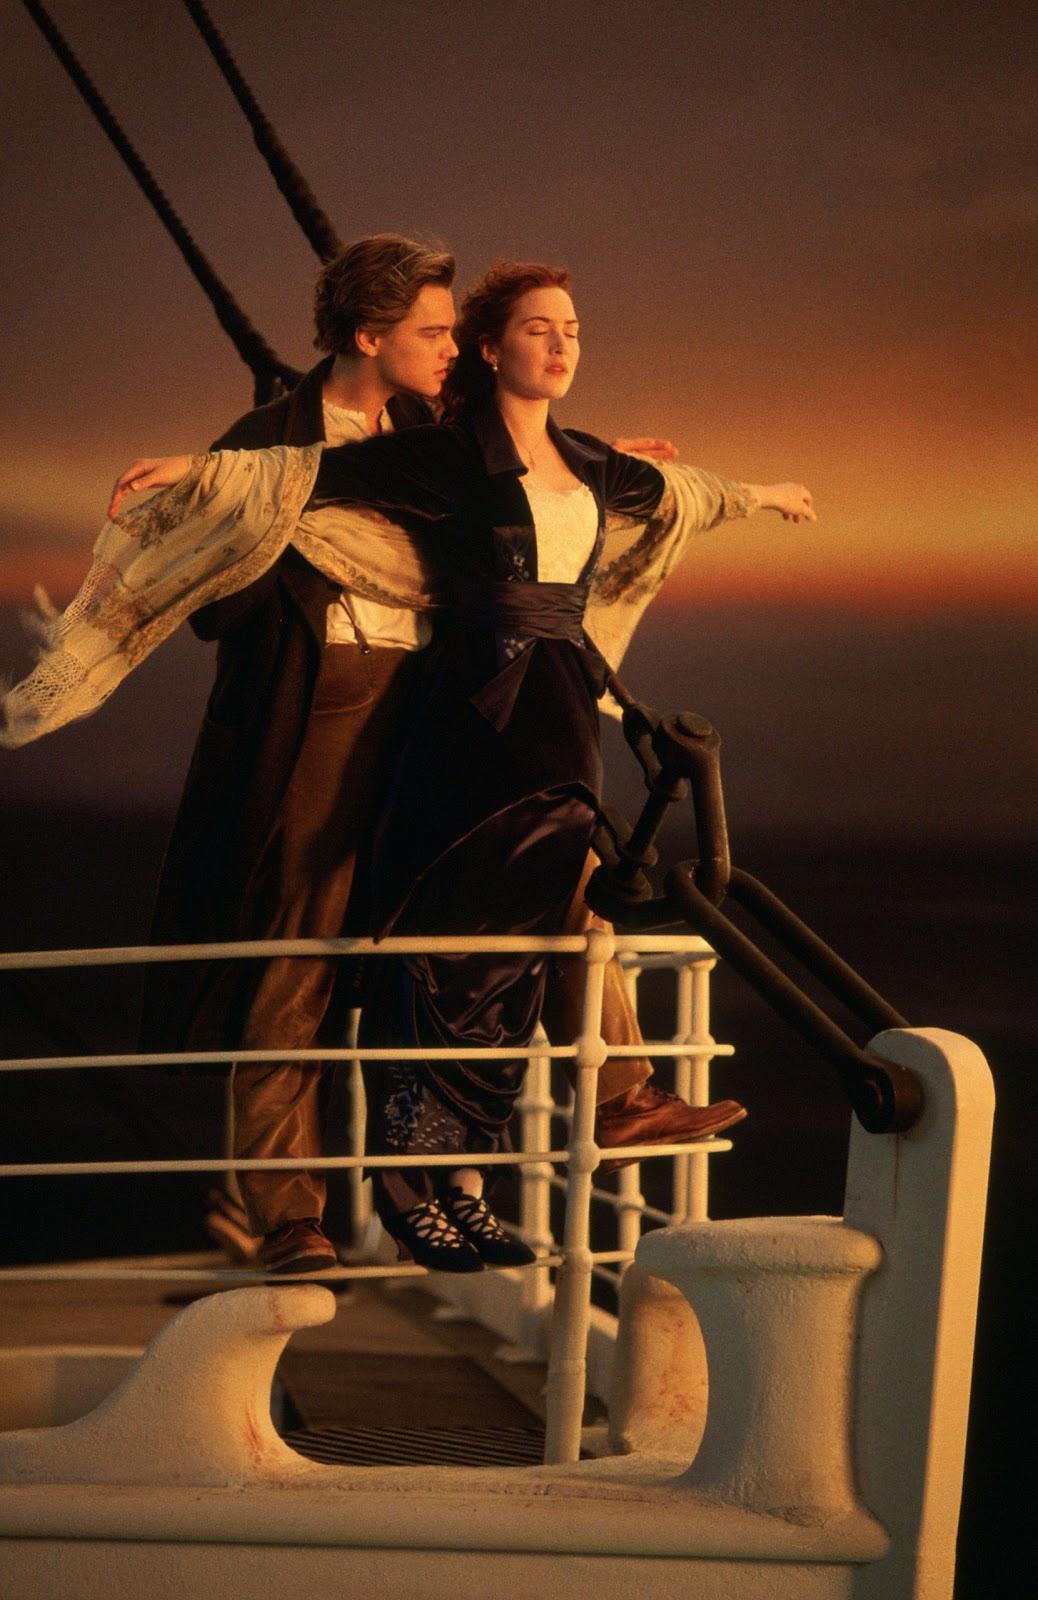 http://3.bp.blogspot.com/-LYo8nnU_ZD0/T05ElDa5vjI/AAAAAAAAH4c/3pBa9hAHMvQ/s1600/Leonardo+DiCaprio+&+Kate+Winslet+in+TITANIC+3D.jpg